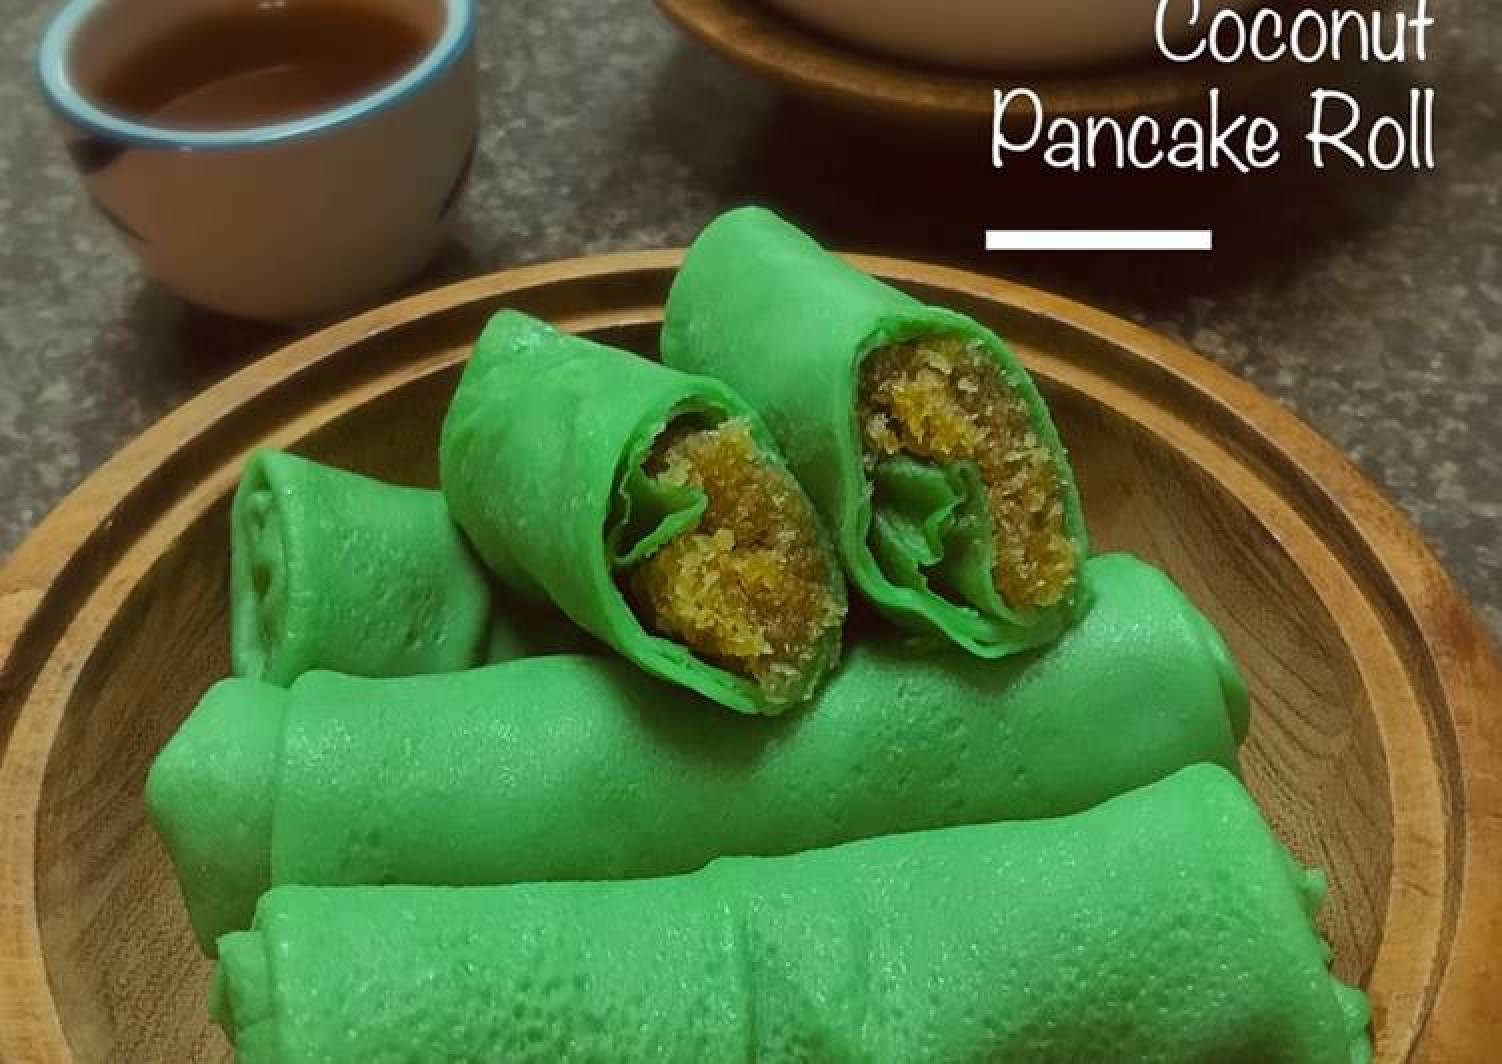 Coconut Pancake Roll